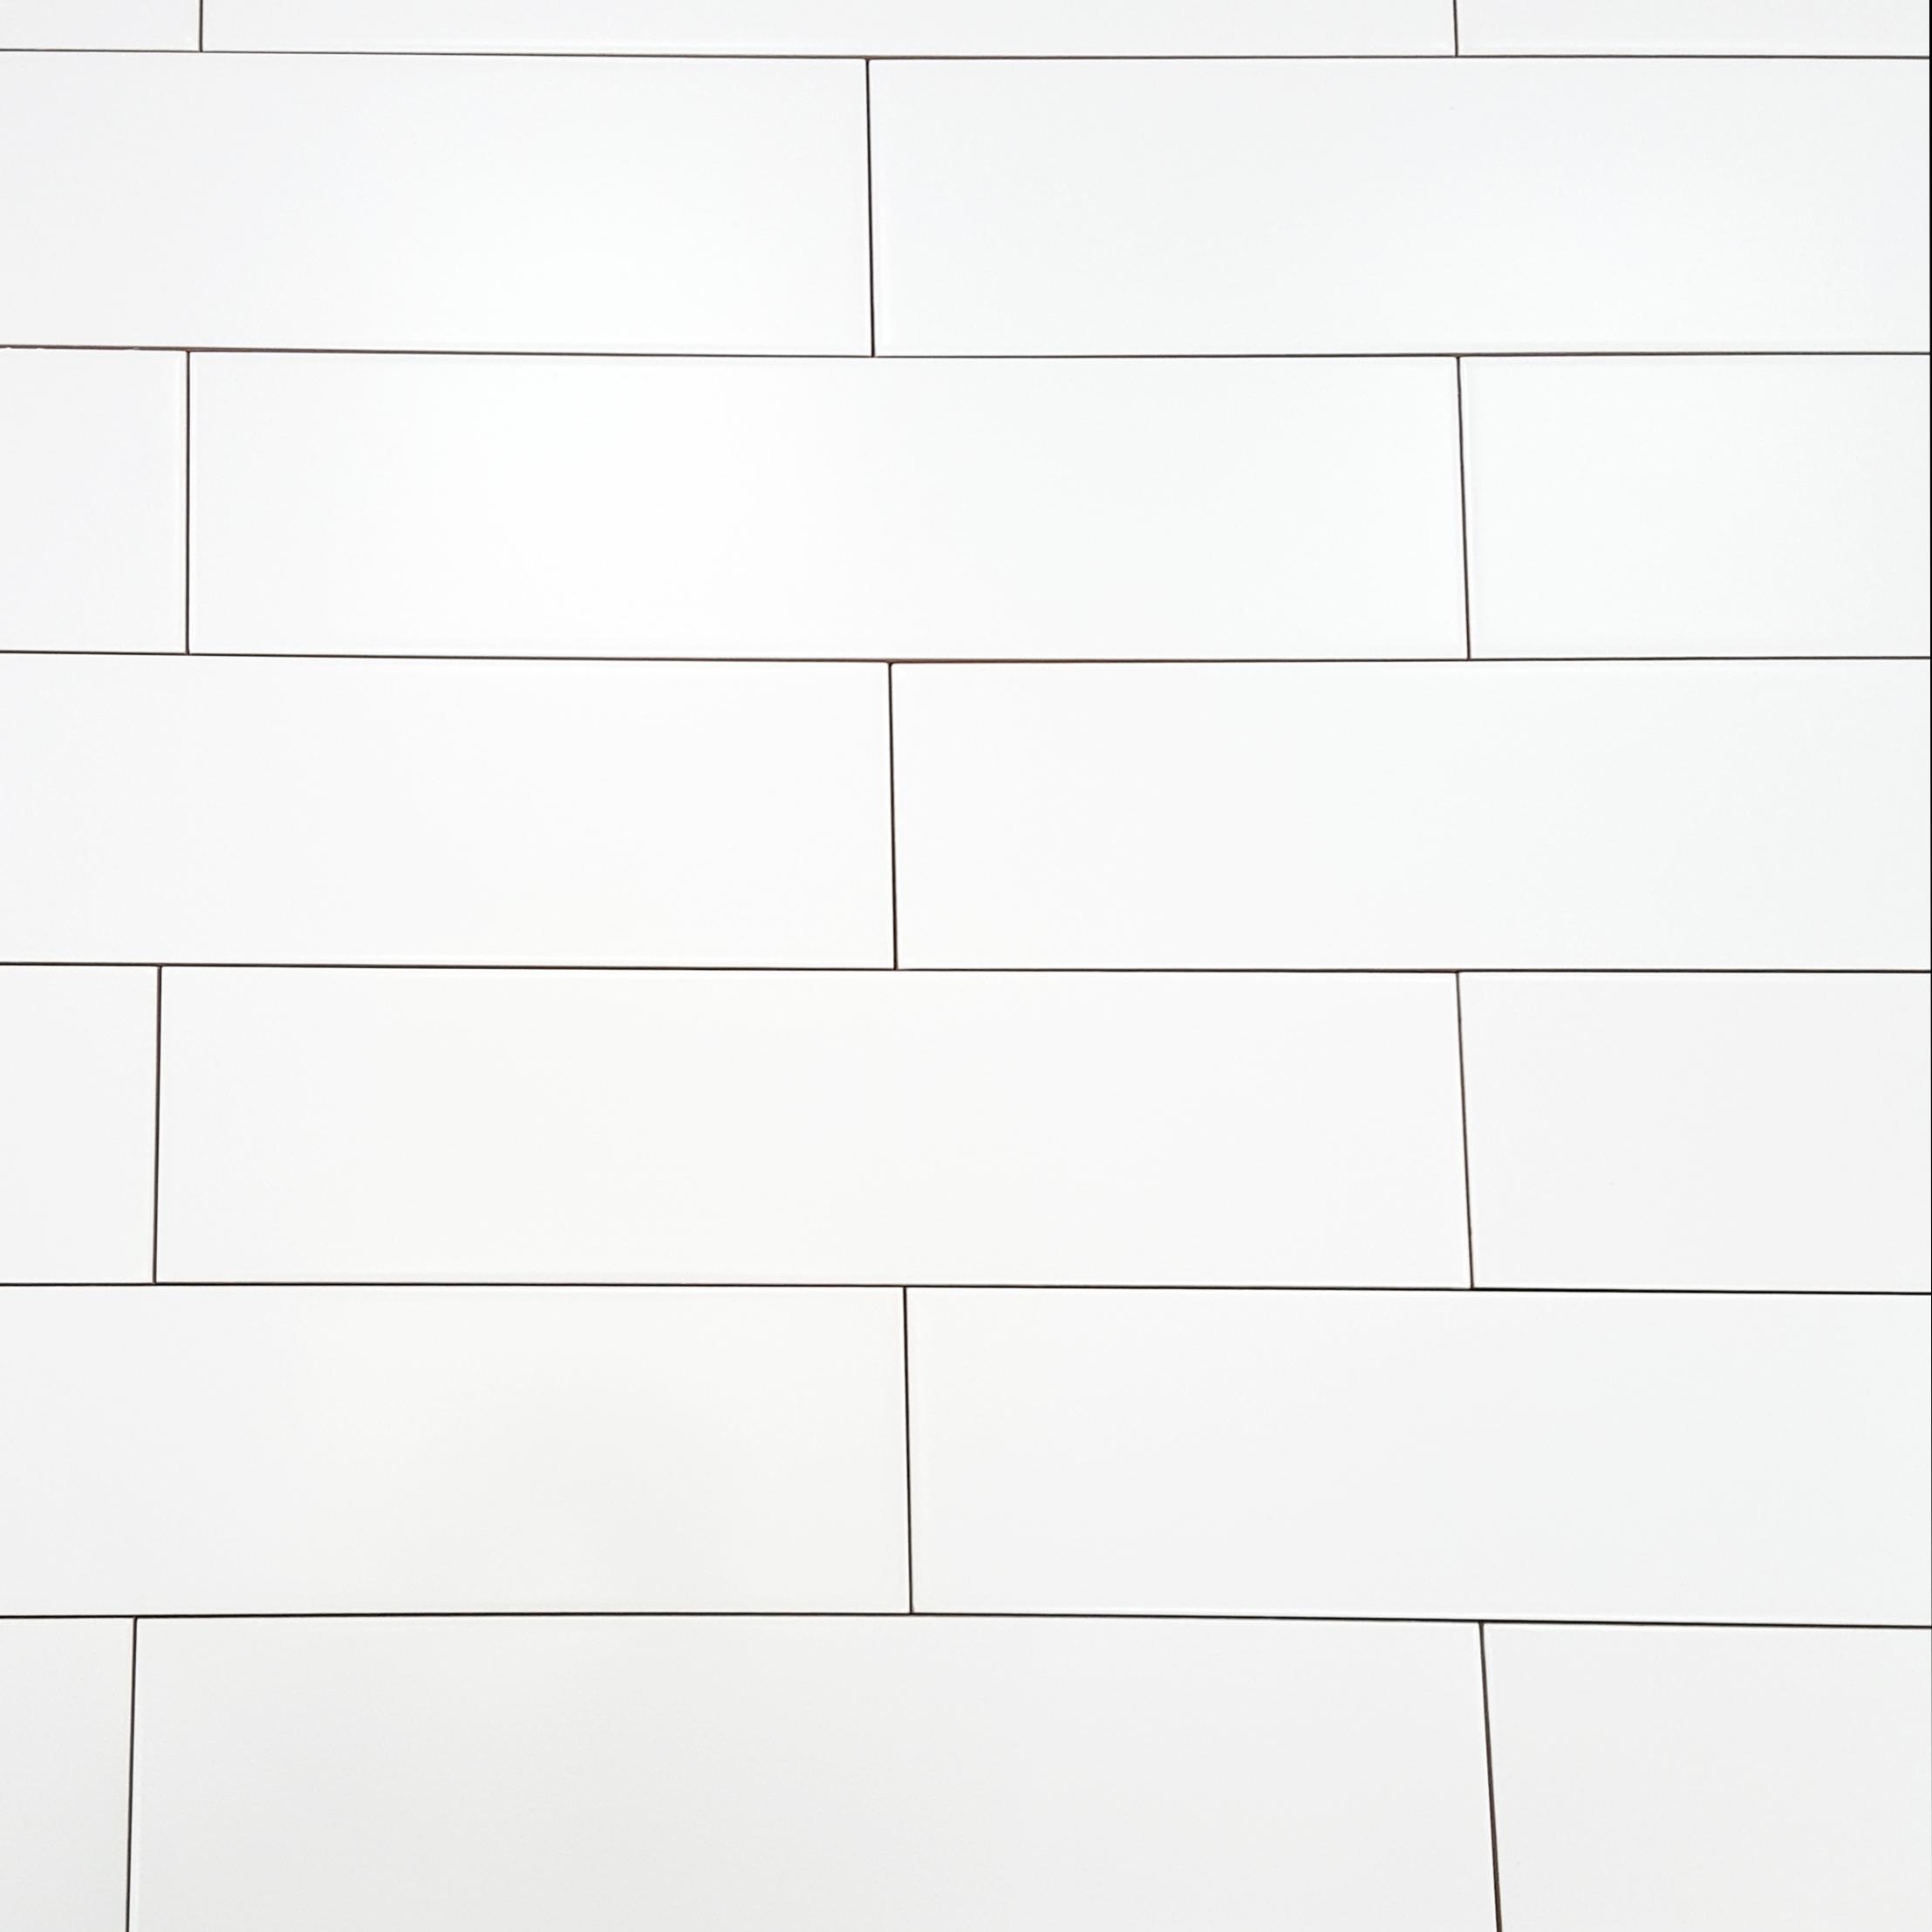 Famous 12X24 Ceramic Tile Huge 18 Inch Ceramic Tile Round 2 X 6 Subway Tile 2 X 8 Glass Subway Tile Youthful 24 X 48 Drop Ceiling Tiles Bright3X6 Ceramic Subway Tile 4 X 16 Ceramic Subway Tile   Tile Designs